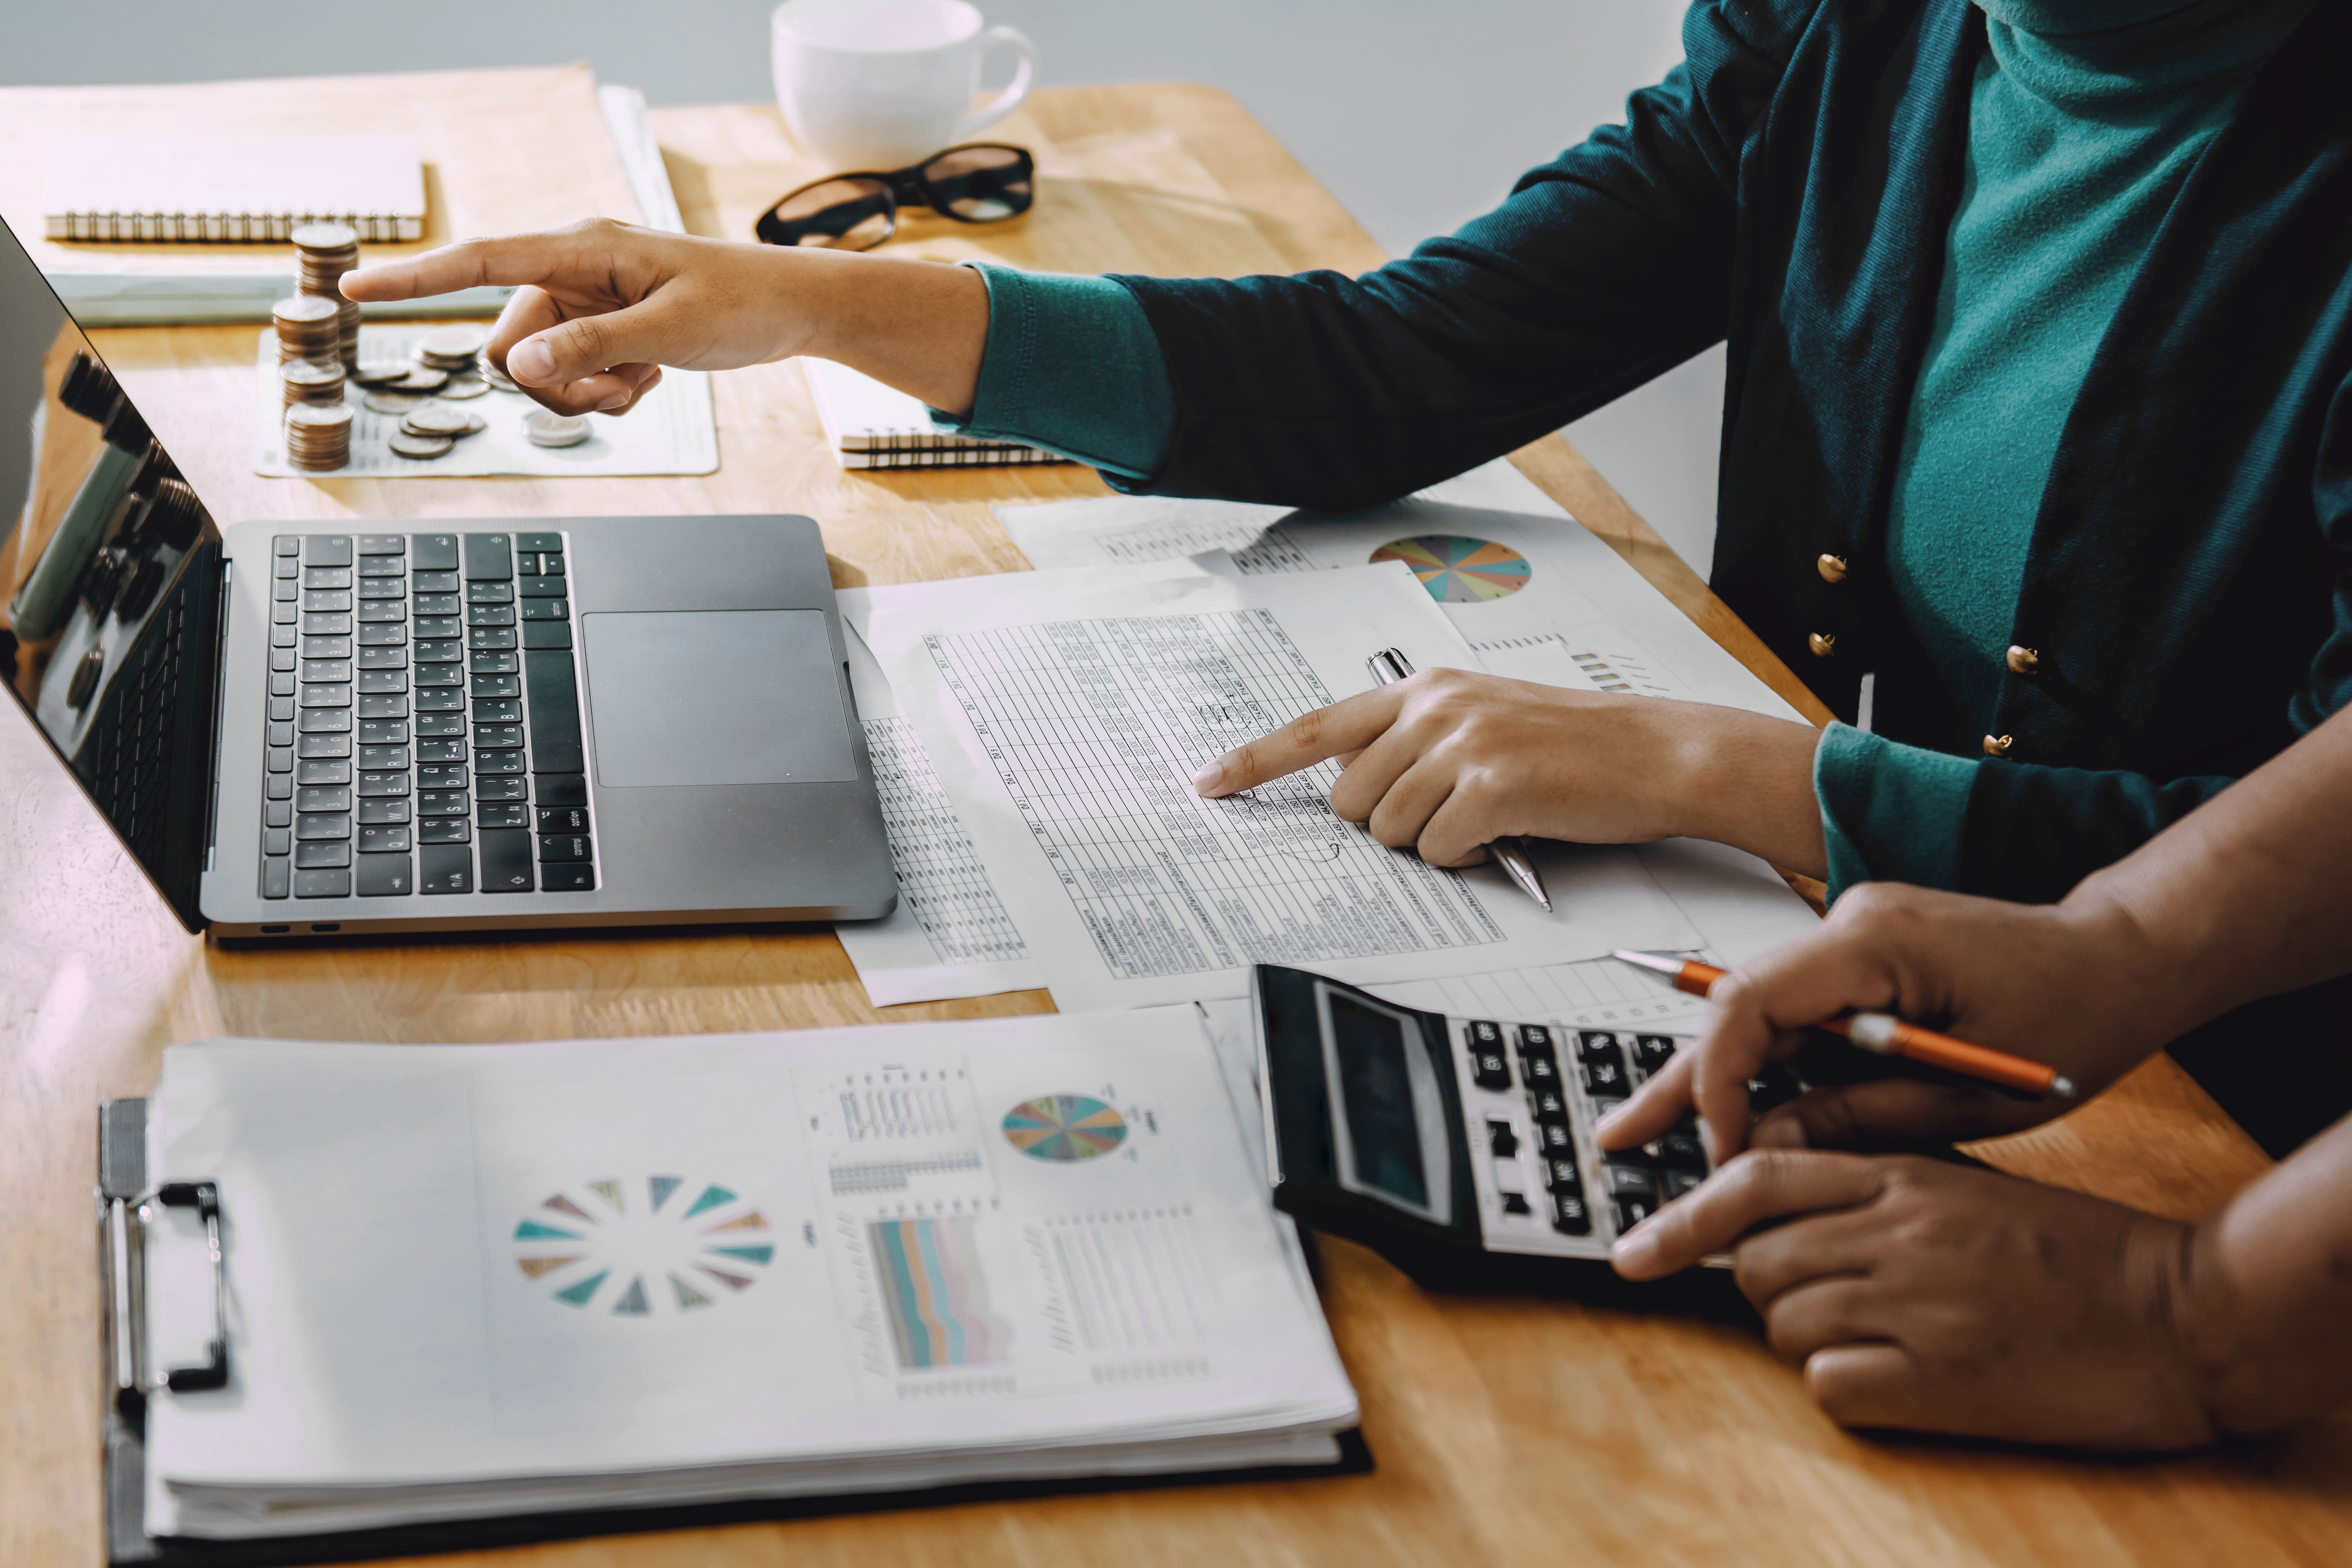 O que fazer se o imposto de renda do cliente cair na malha fina?